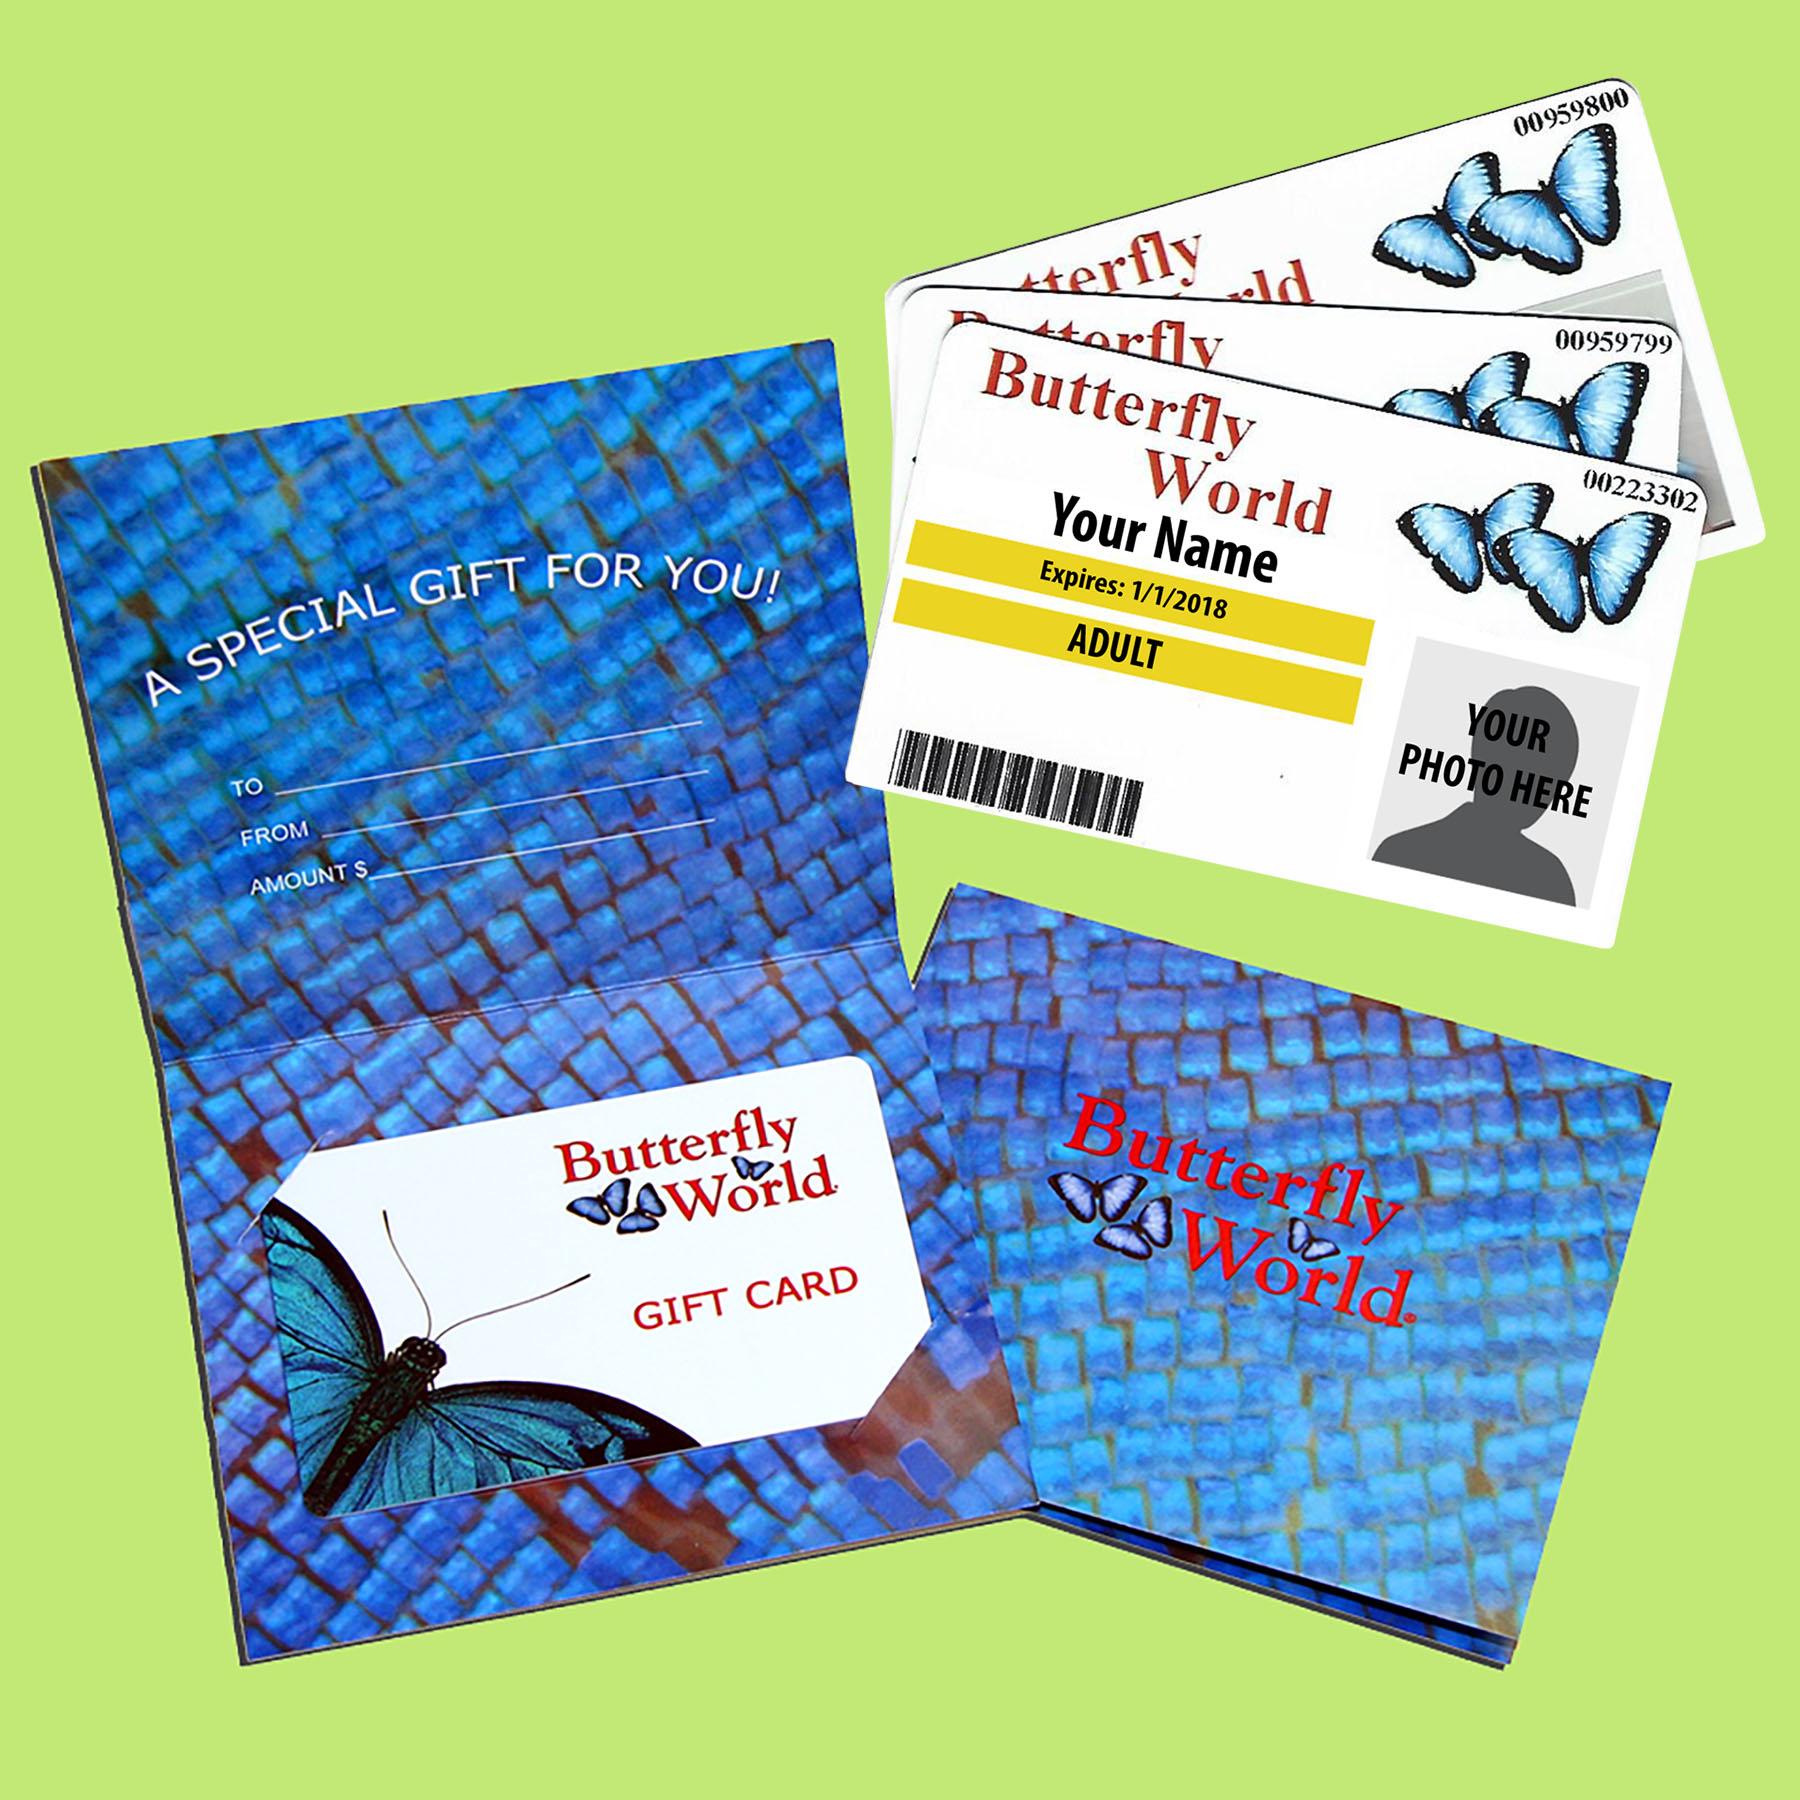 Annual Membership & Gift Cards